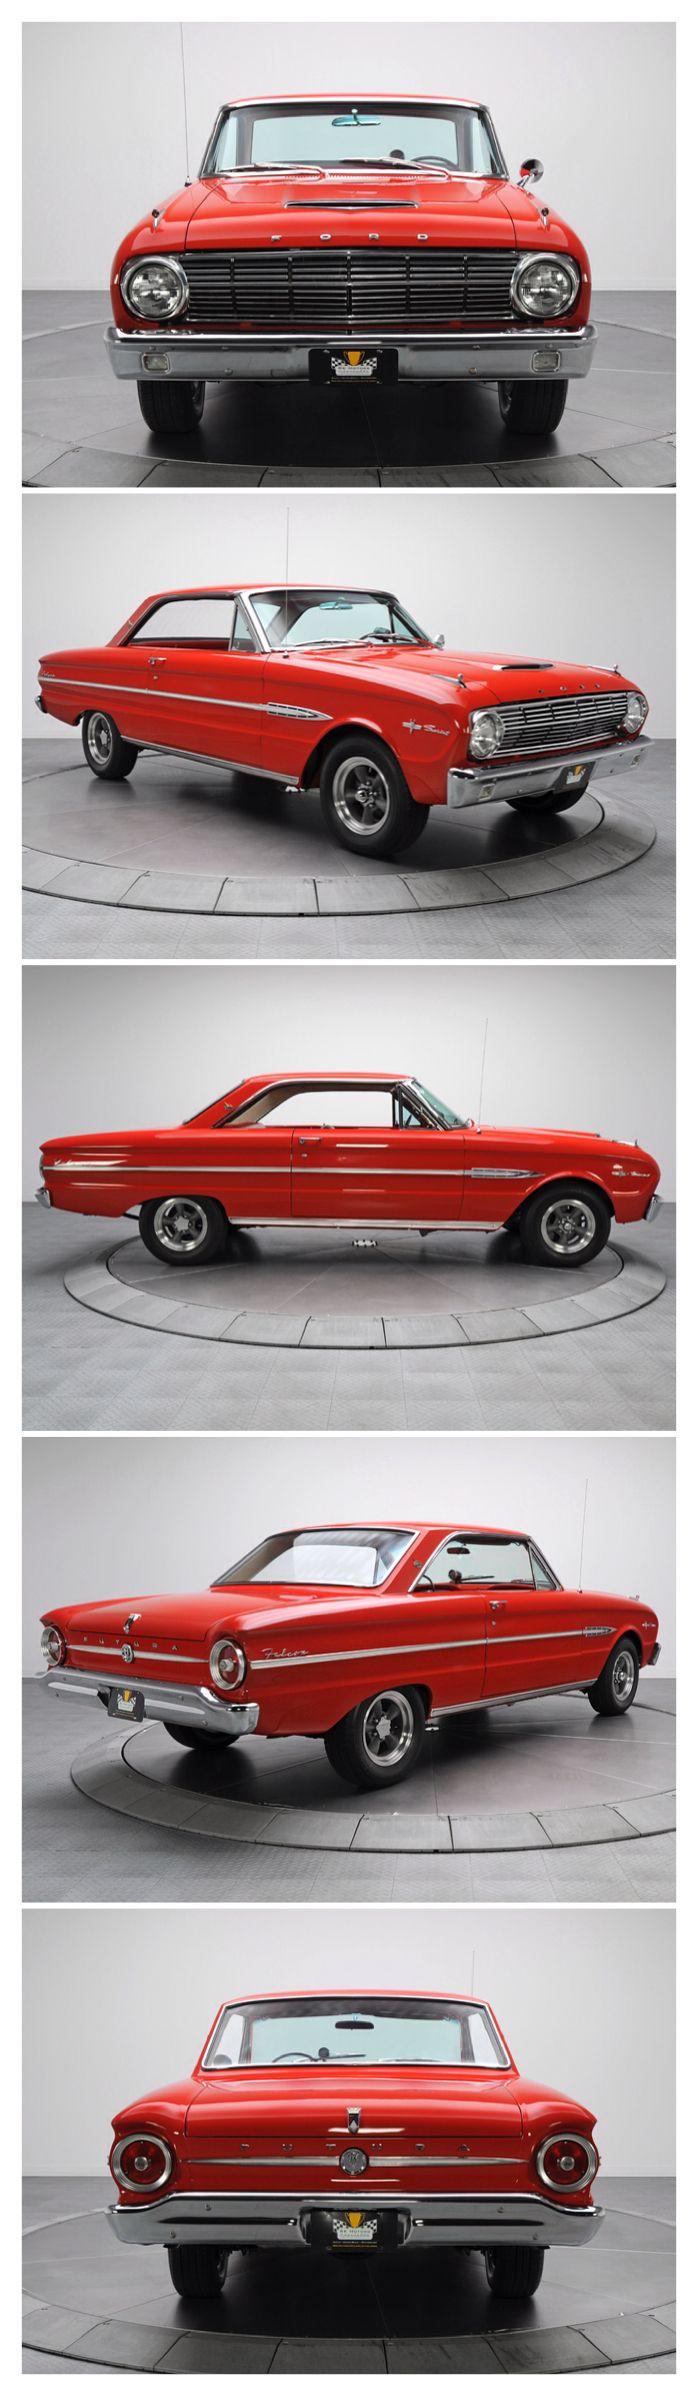 1963 Ford Falcon Futura Sprint                                                                                                                                                                                 Más